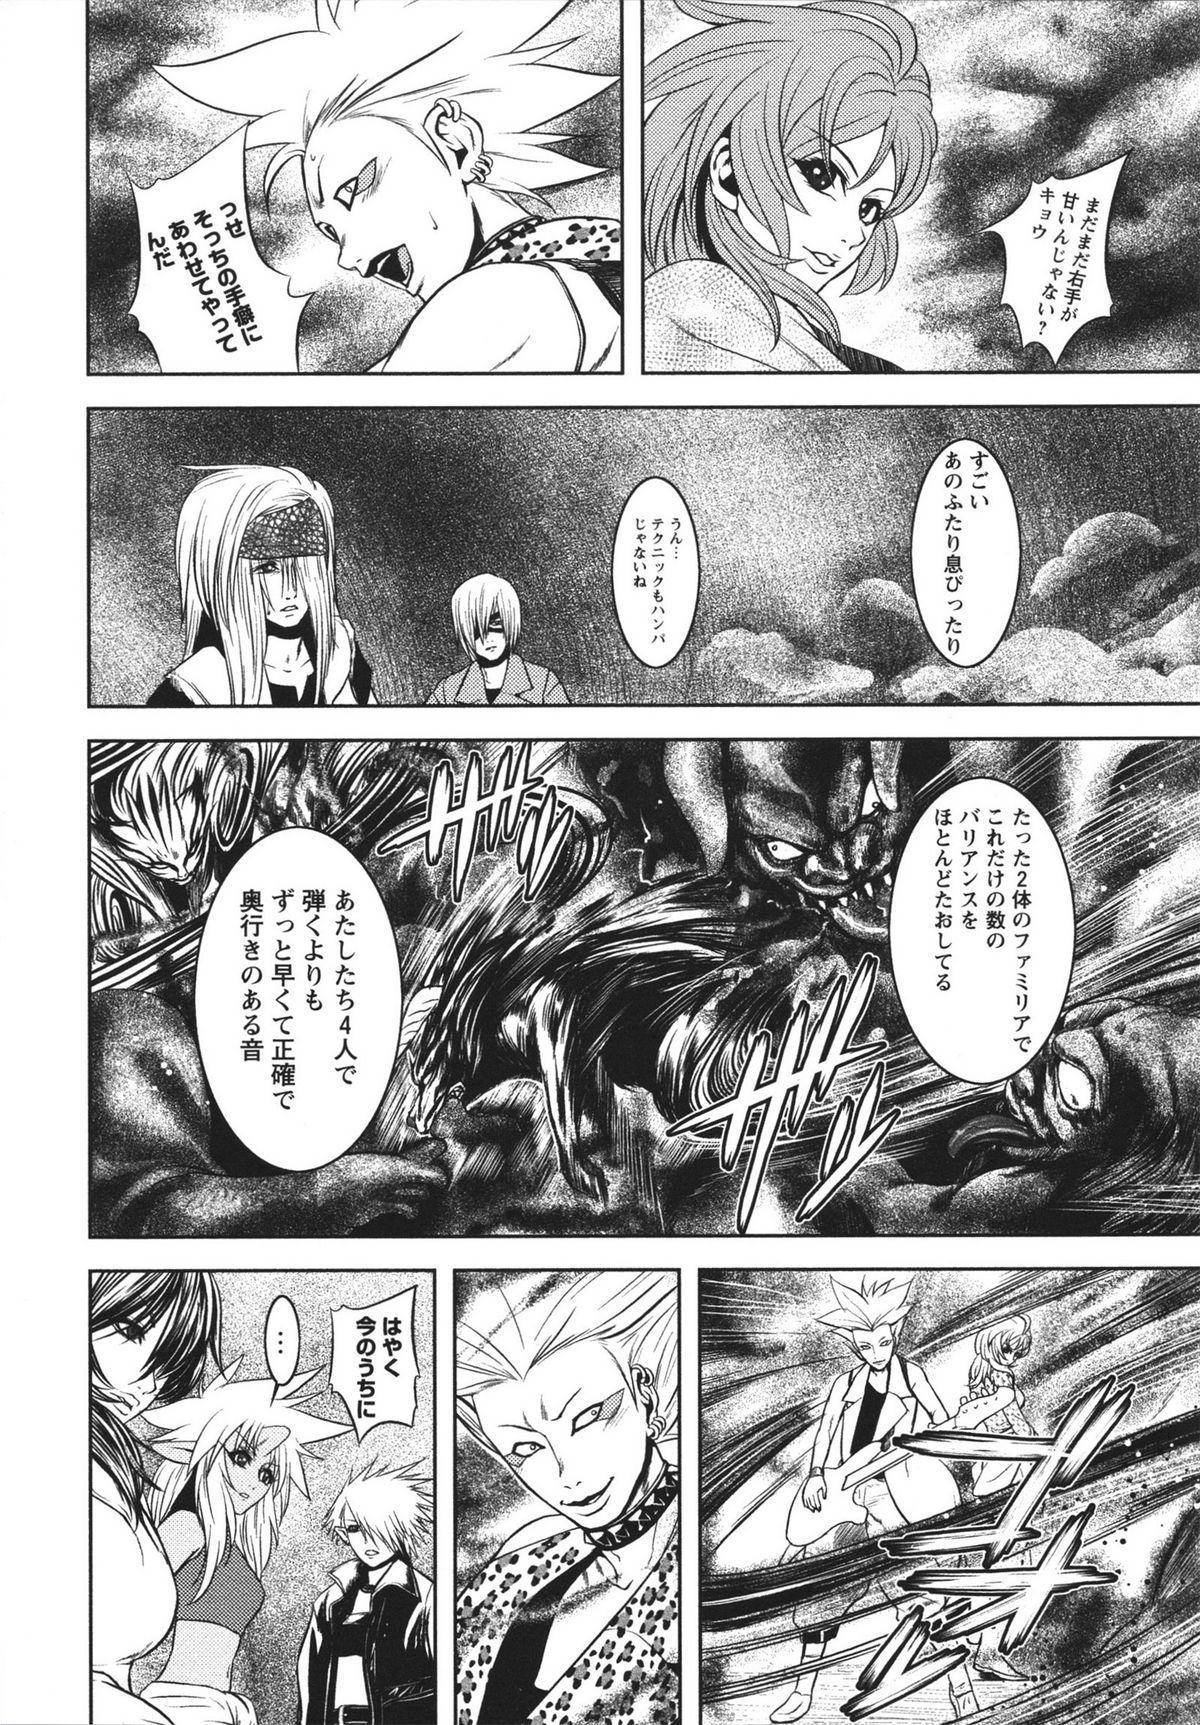 [Kawazuko Chouji] m7 -Minor Seven- Jou 181